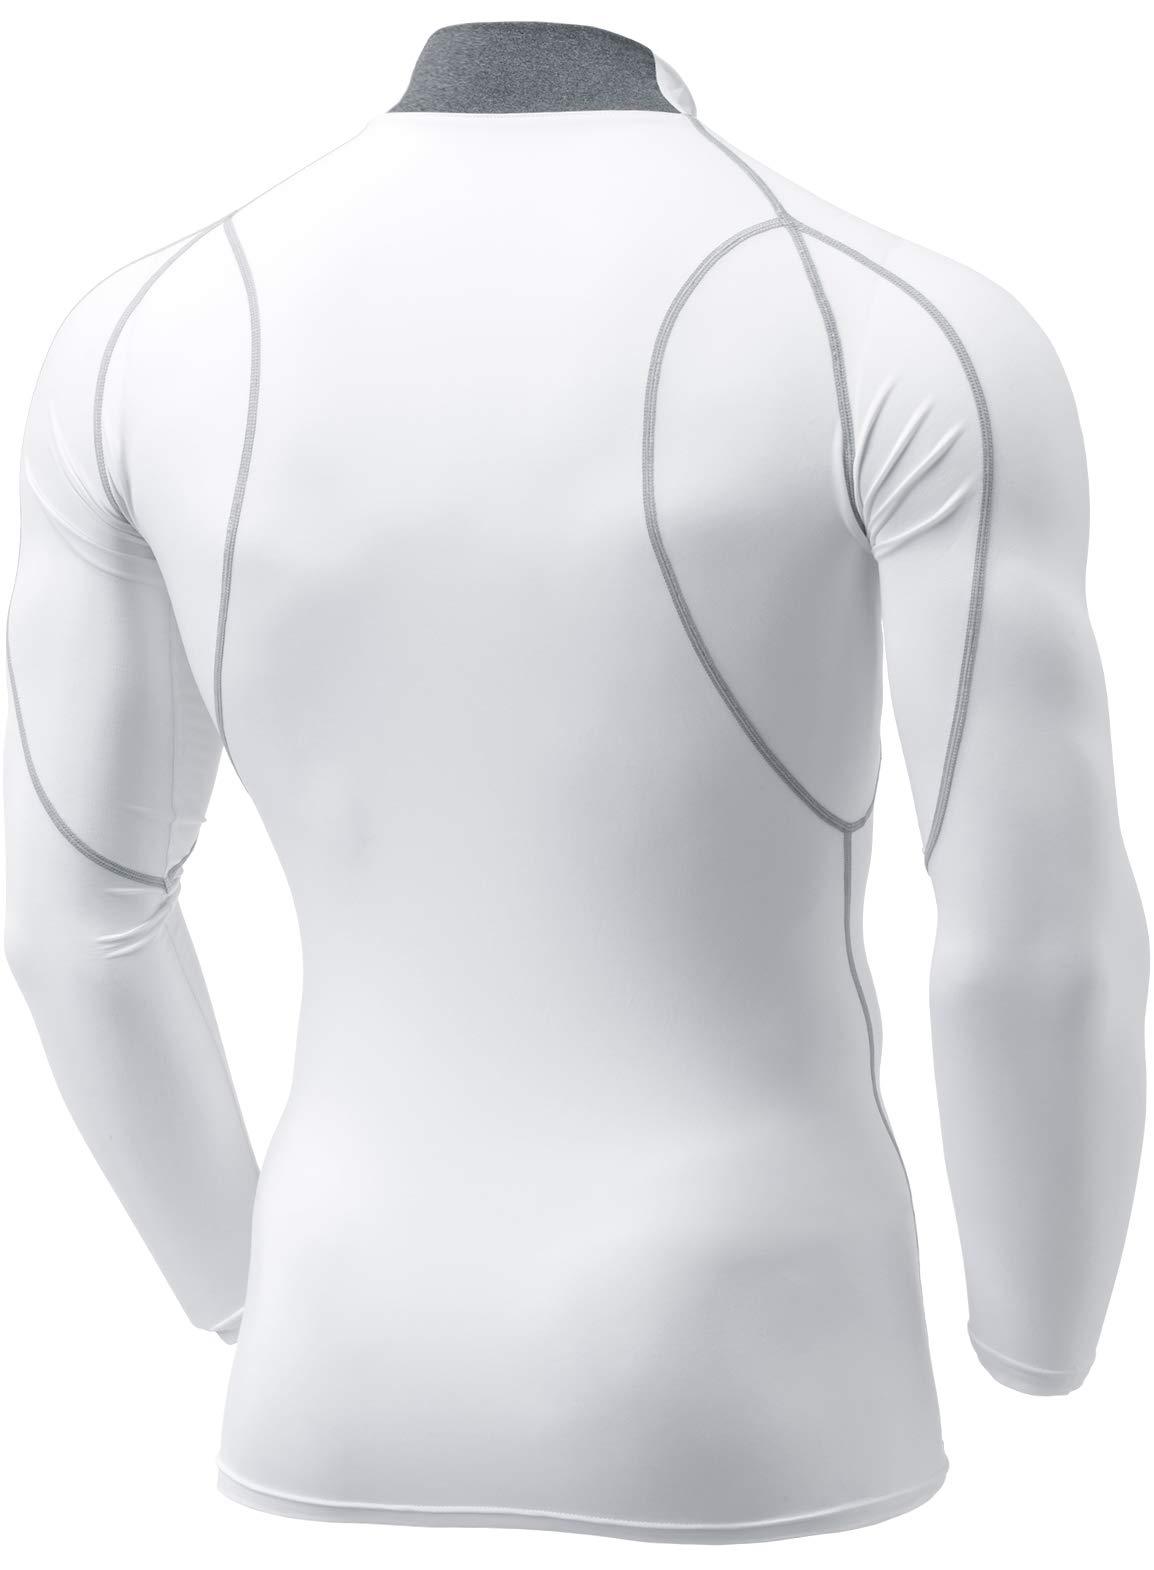 f9e994d100 Tesla TM-MUT12-WHT Medium Men s Mock Long-Sleeved T-Shirt Cool Dry  Compression Baselayer MUT12 - US17091 TMMUT12WHT L   Men   Sports    Outdoors - tibs